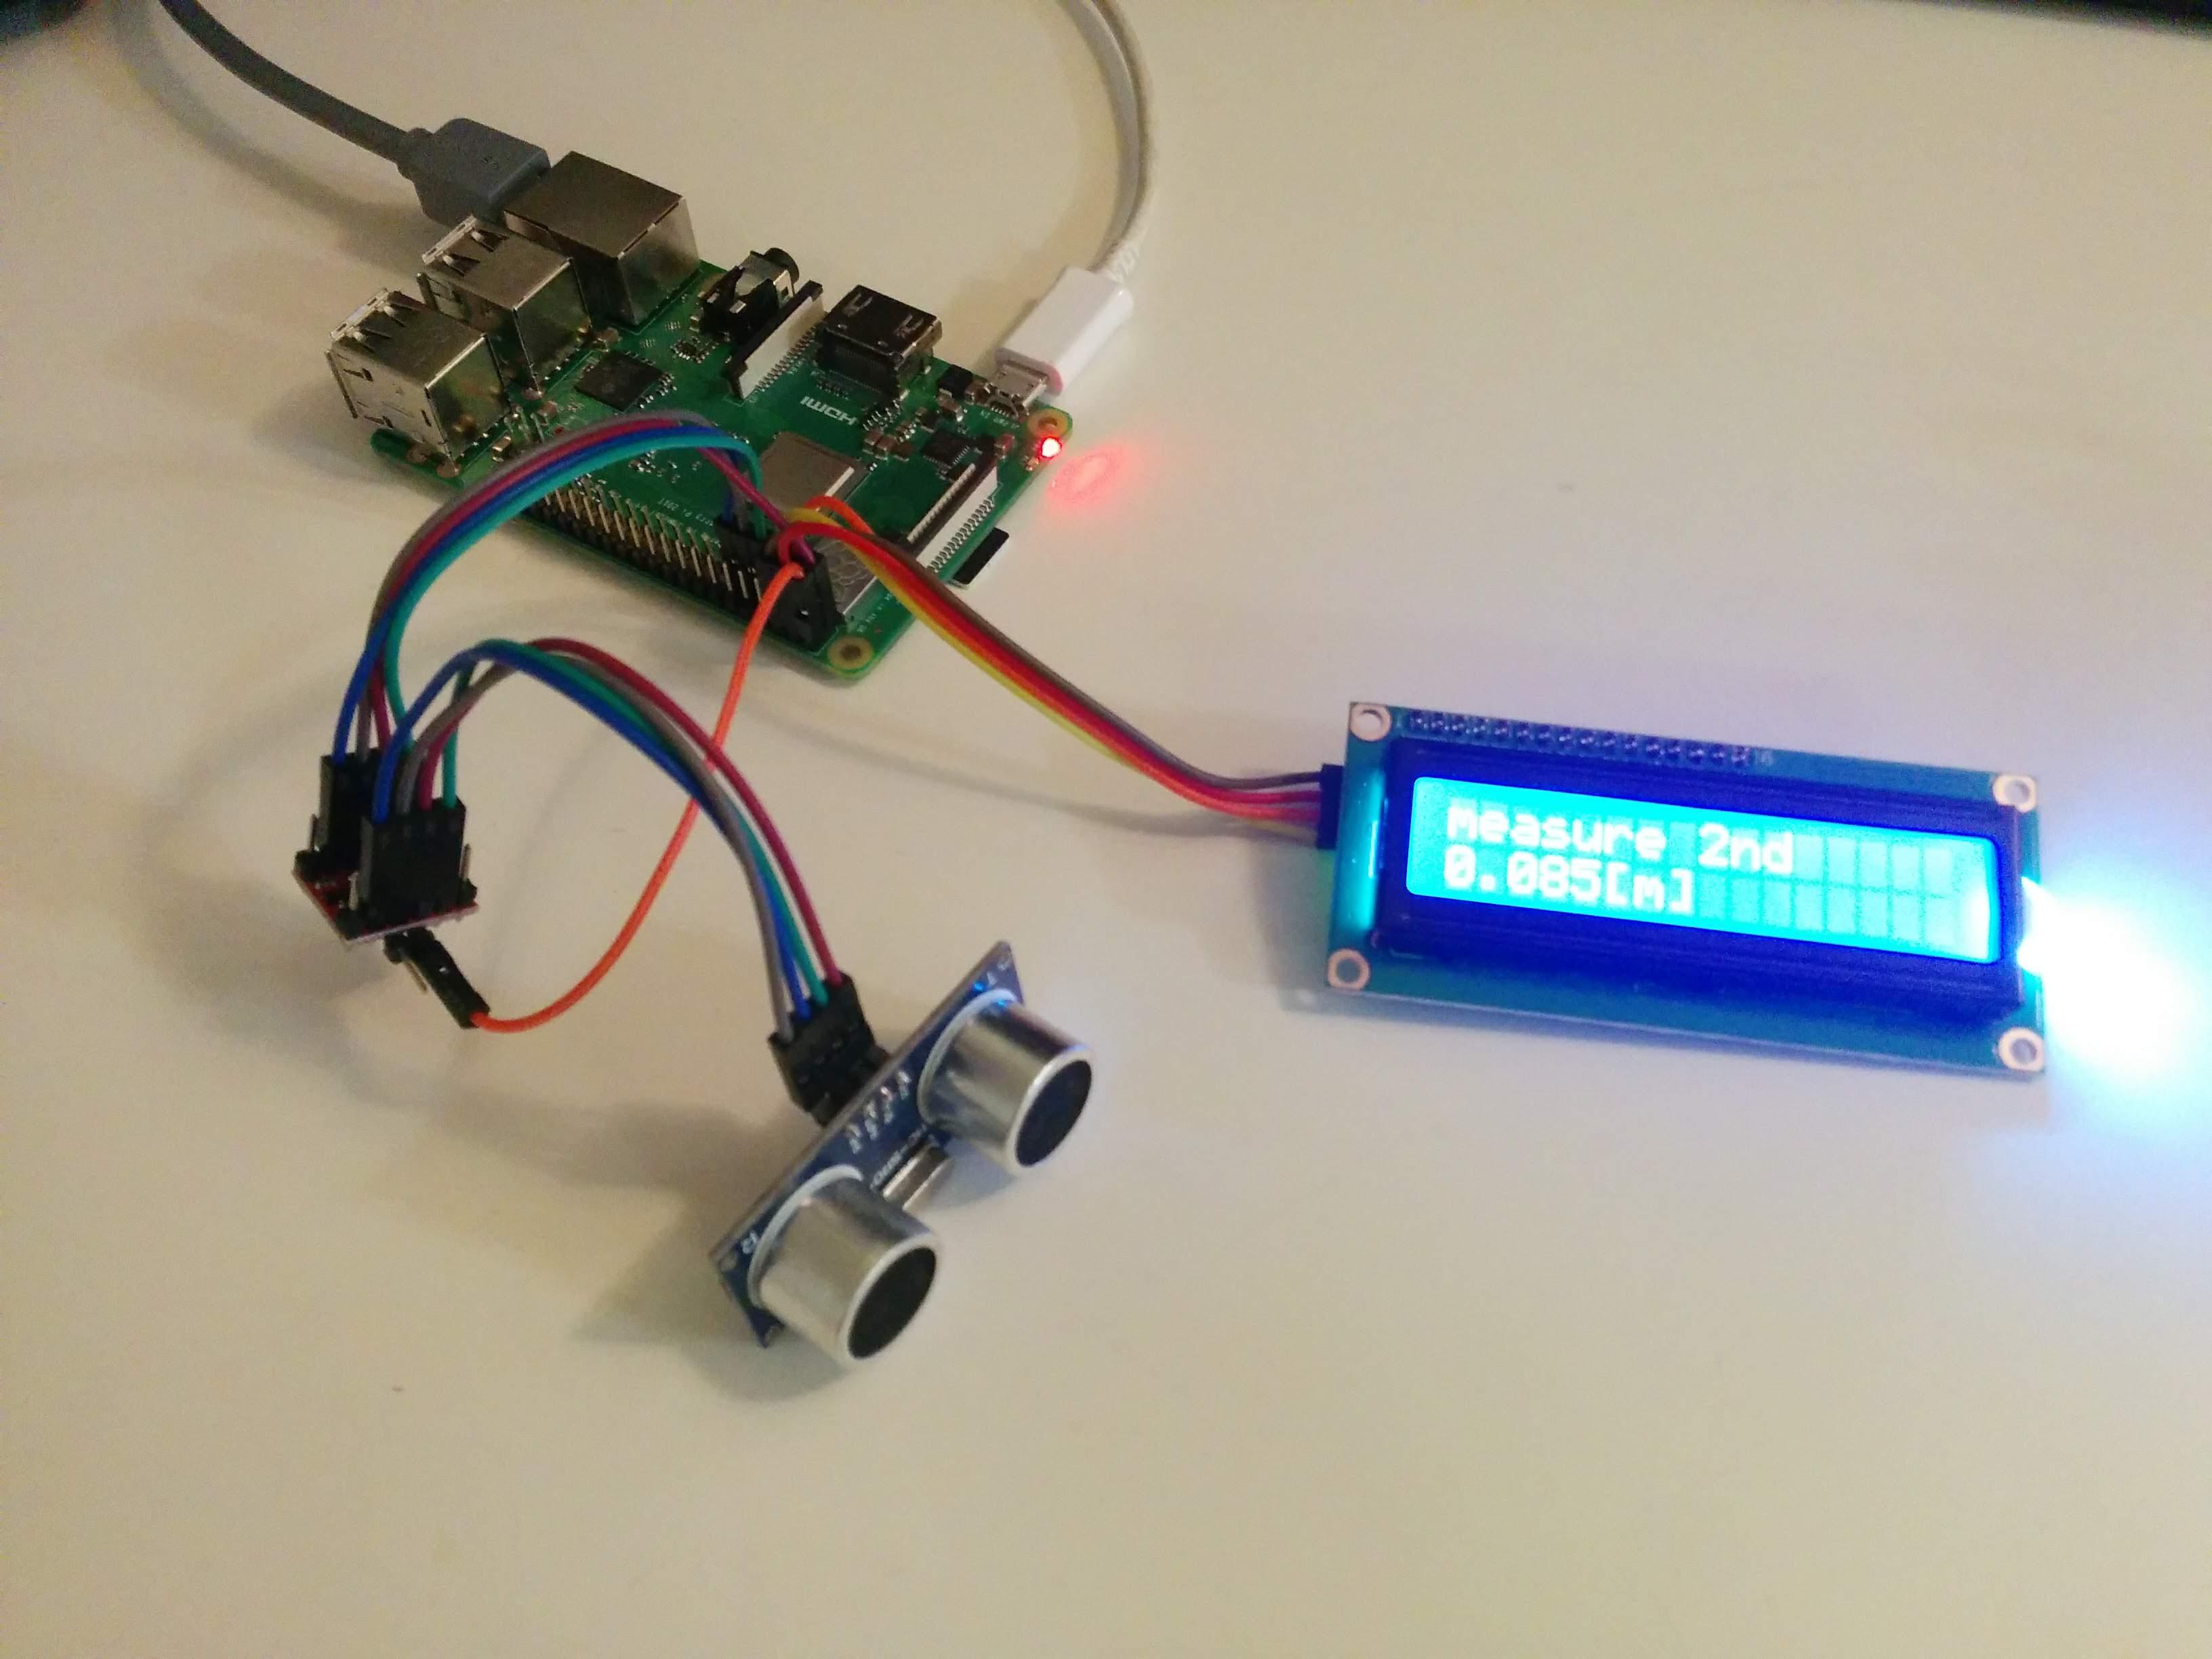 CGI Server control Ultrasonic Sensor and I2C LCD on